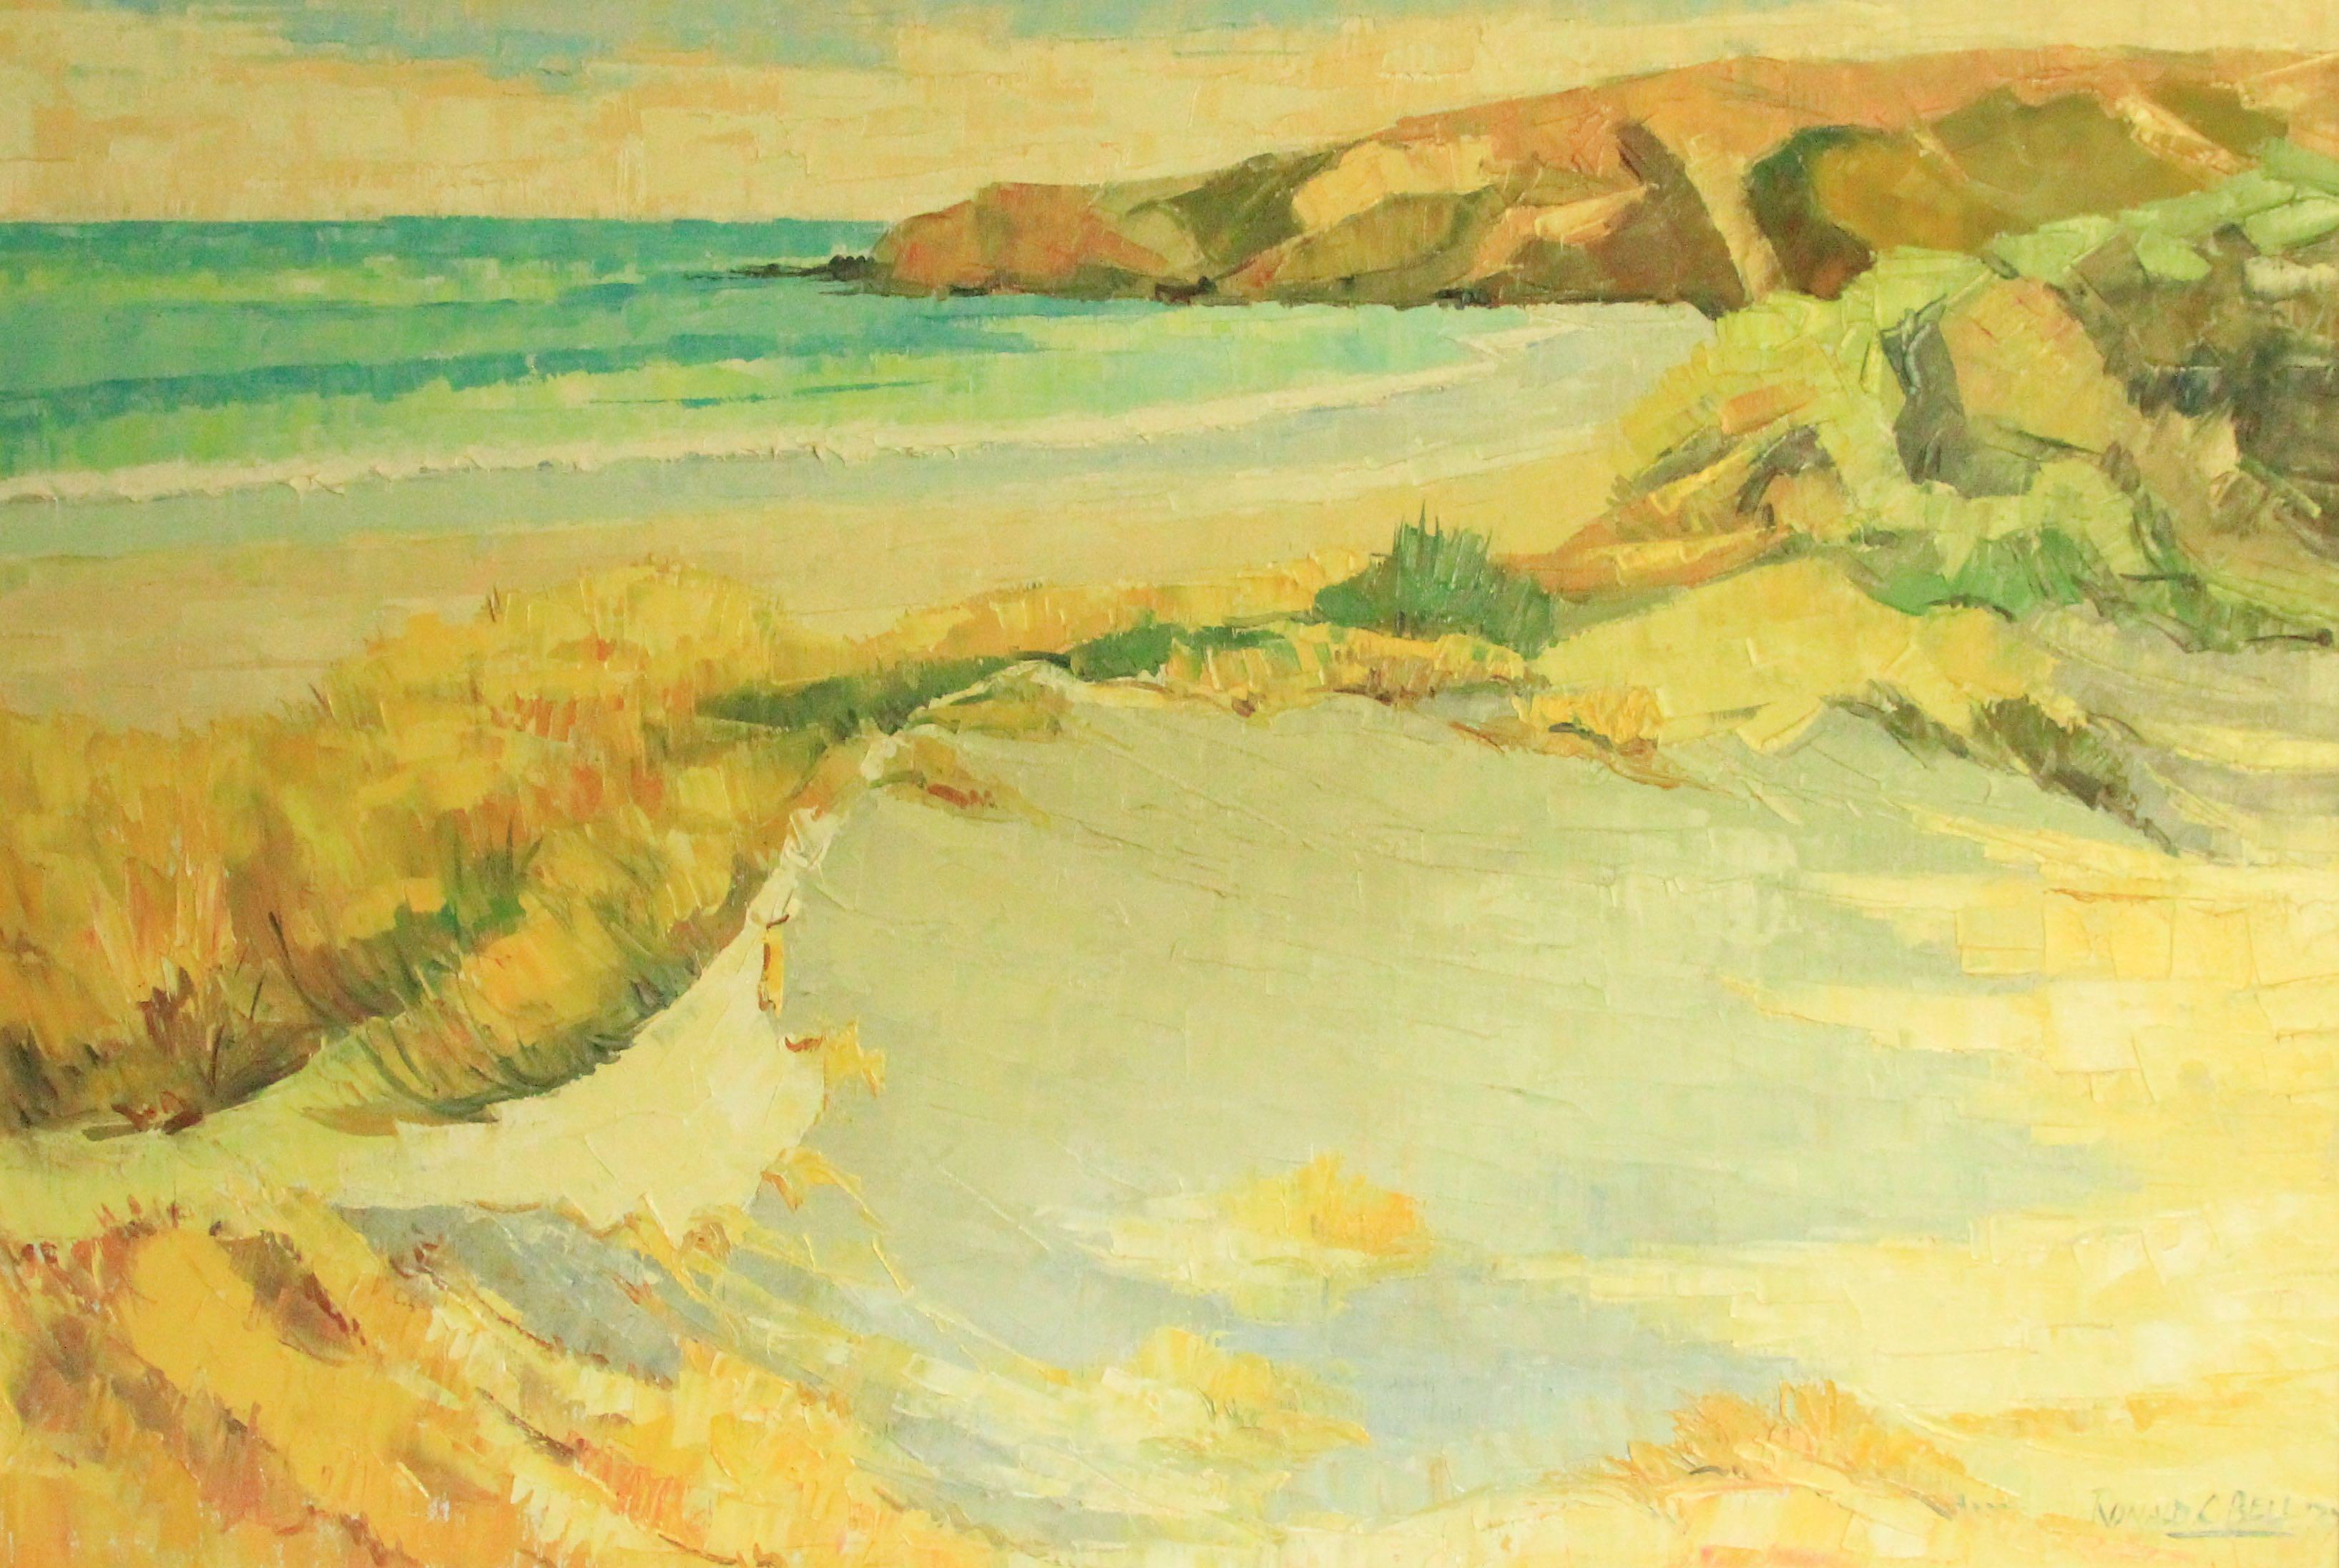 Snellings Beach by Ronald C Bell